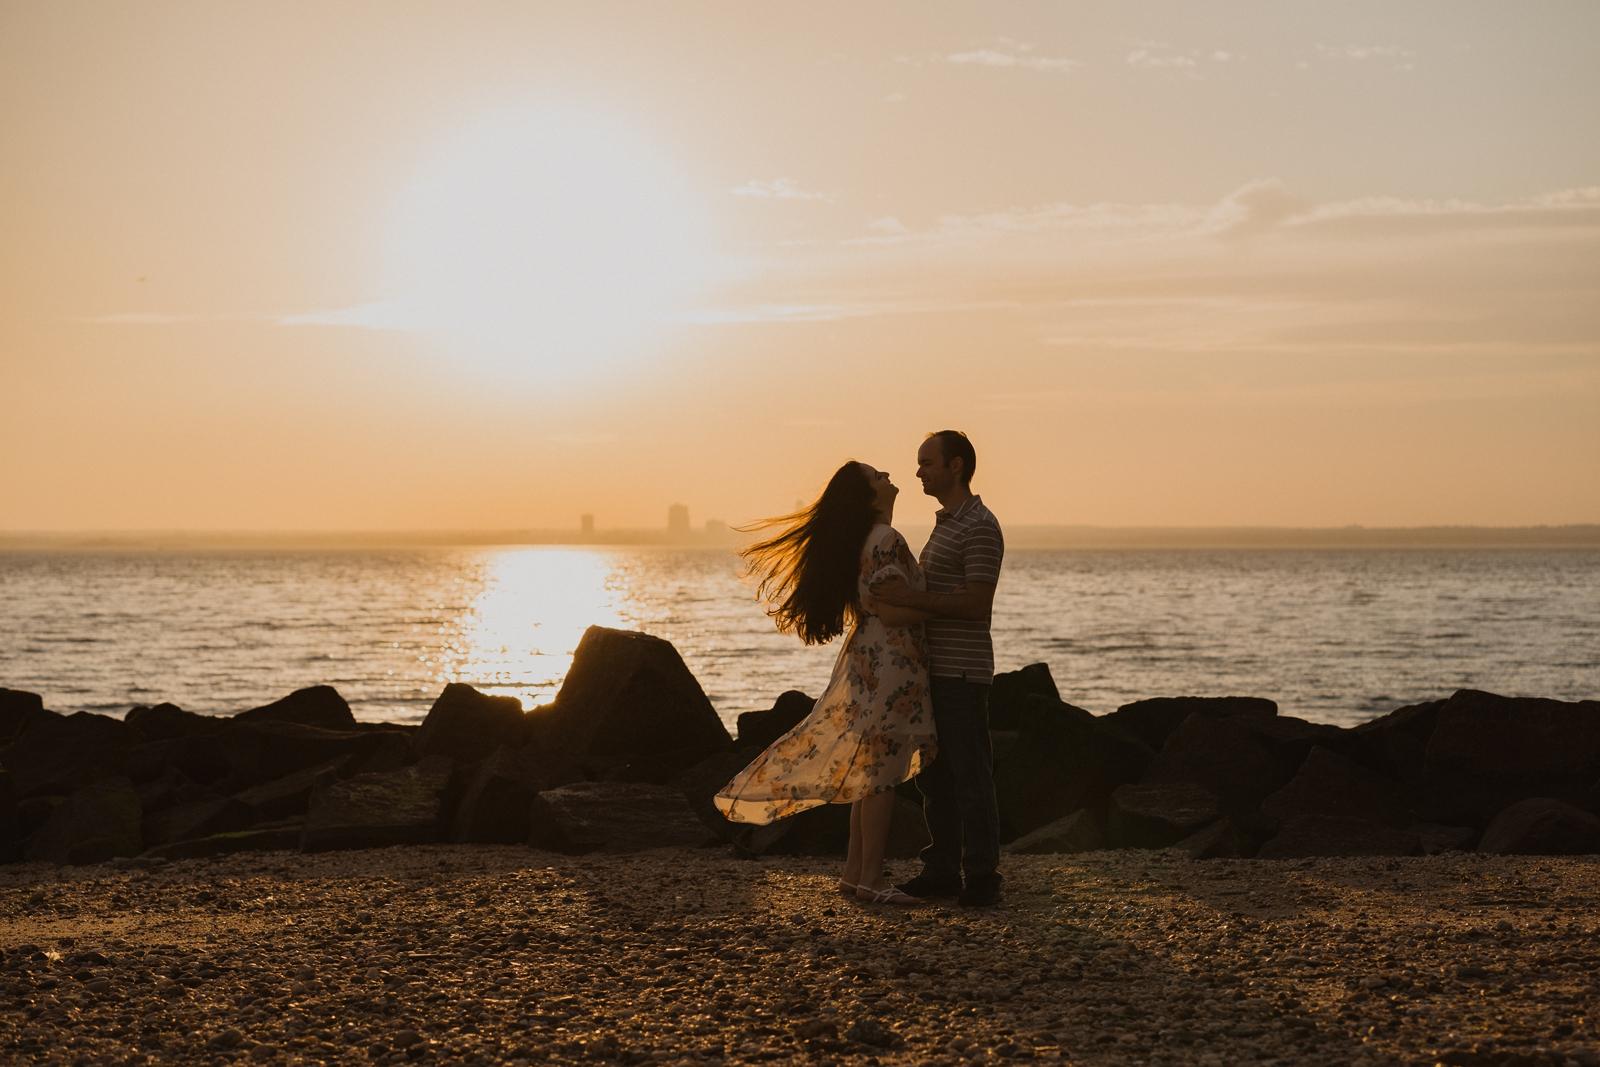 Ashley_James_Engagement_Morgan Park_Glen Cove_Sneak-May 20, 2019-14_blog.jpg